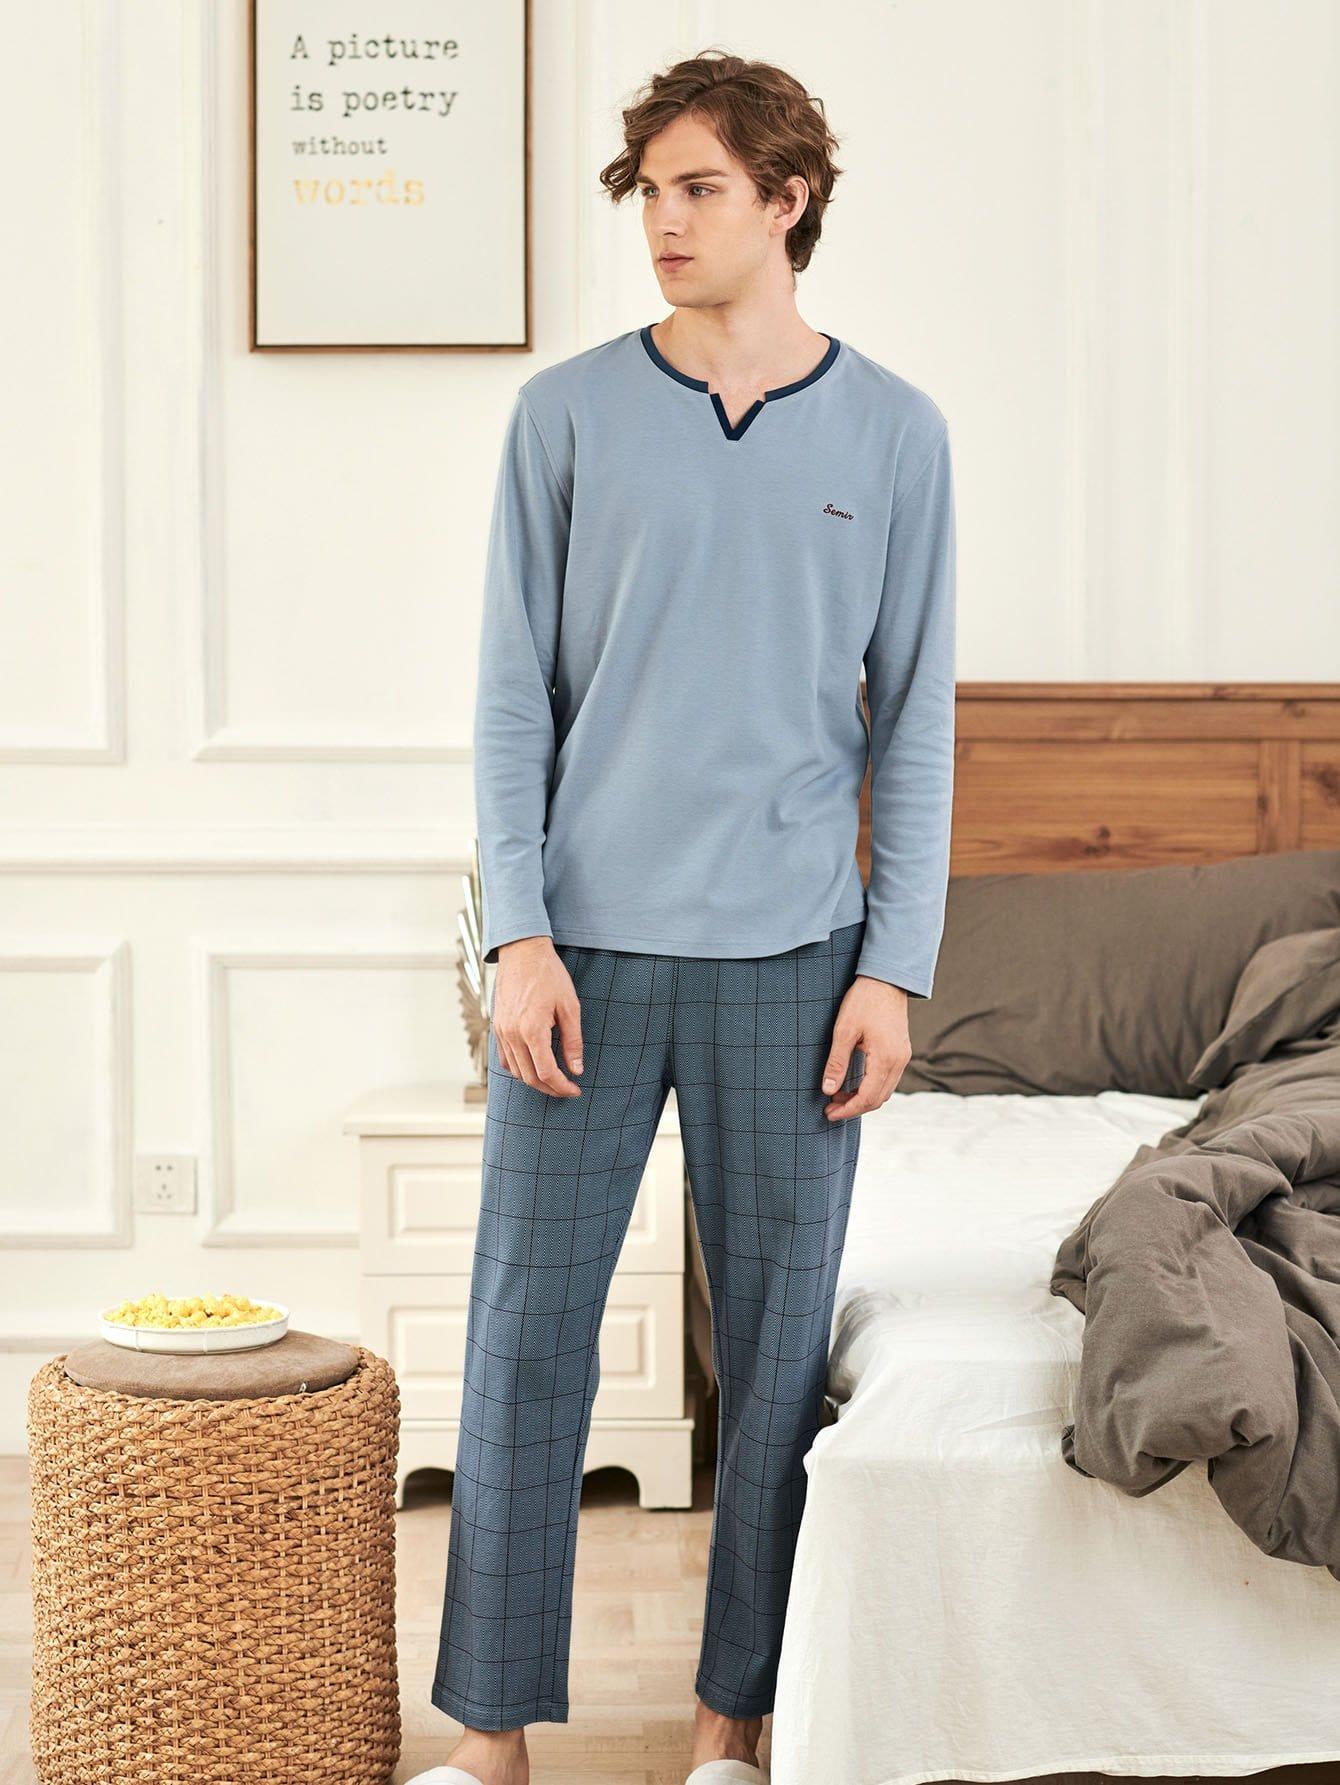 Men Letter Embroidered Plaid Pajama Set Men Letter Embroidered Plaid Pajama Set